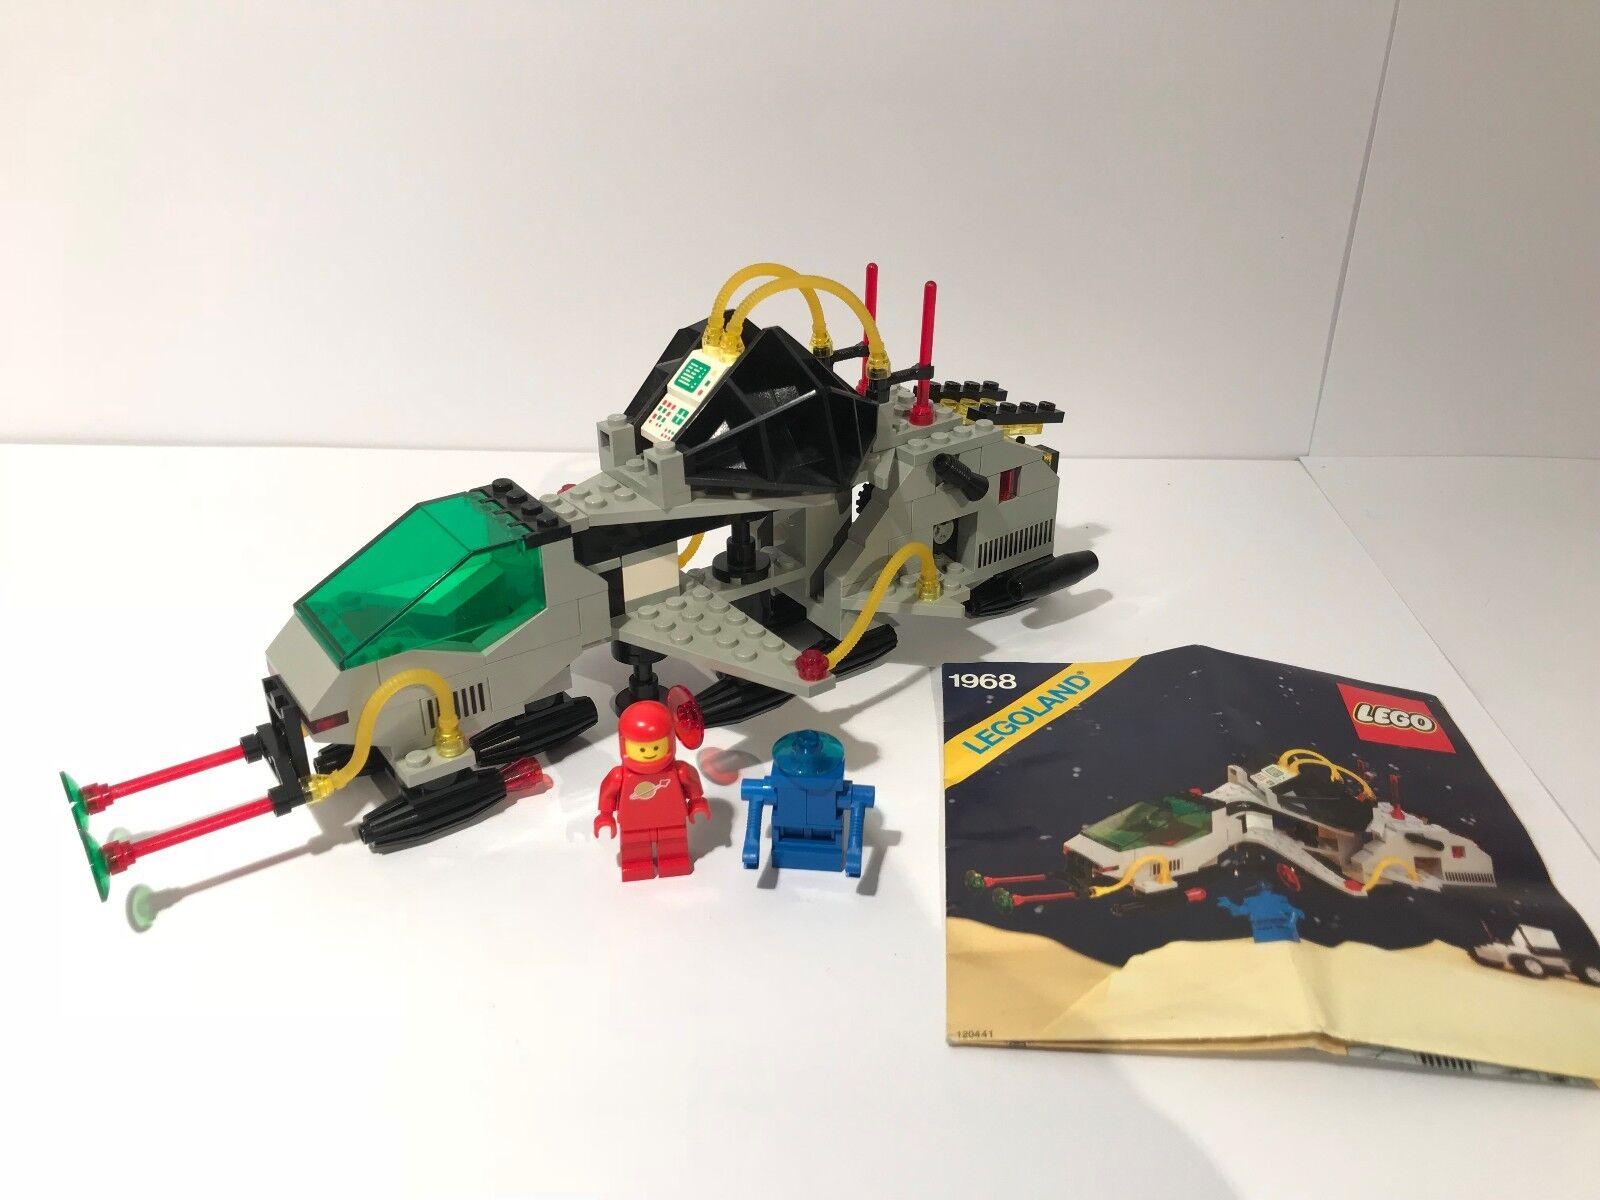 LEGO ® Legoland Space Classic 1968 UNKNOWN Set 80 80 80 er Selten mit Original BA 38a848